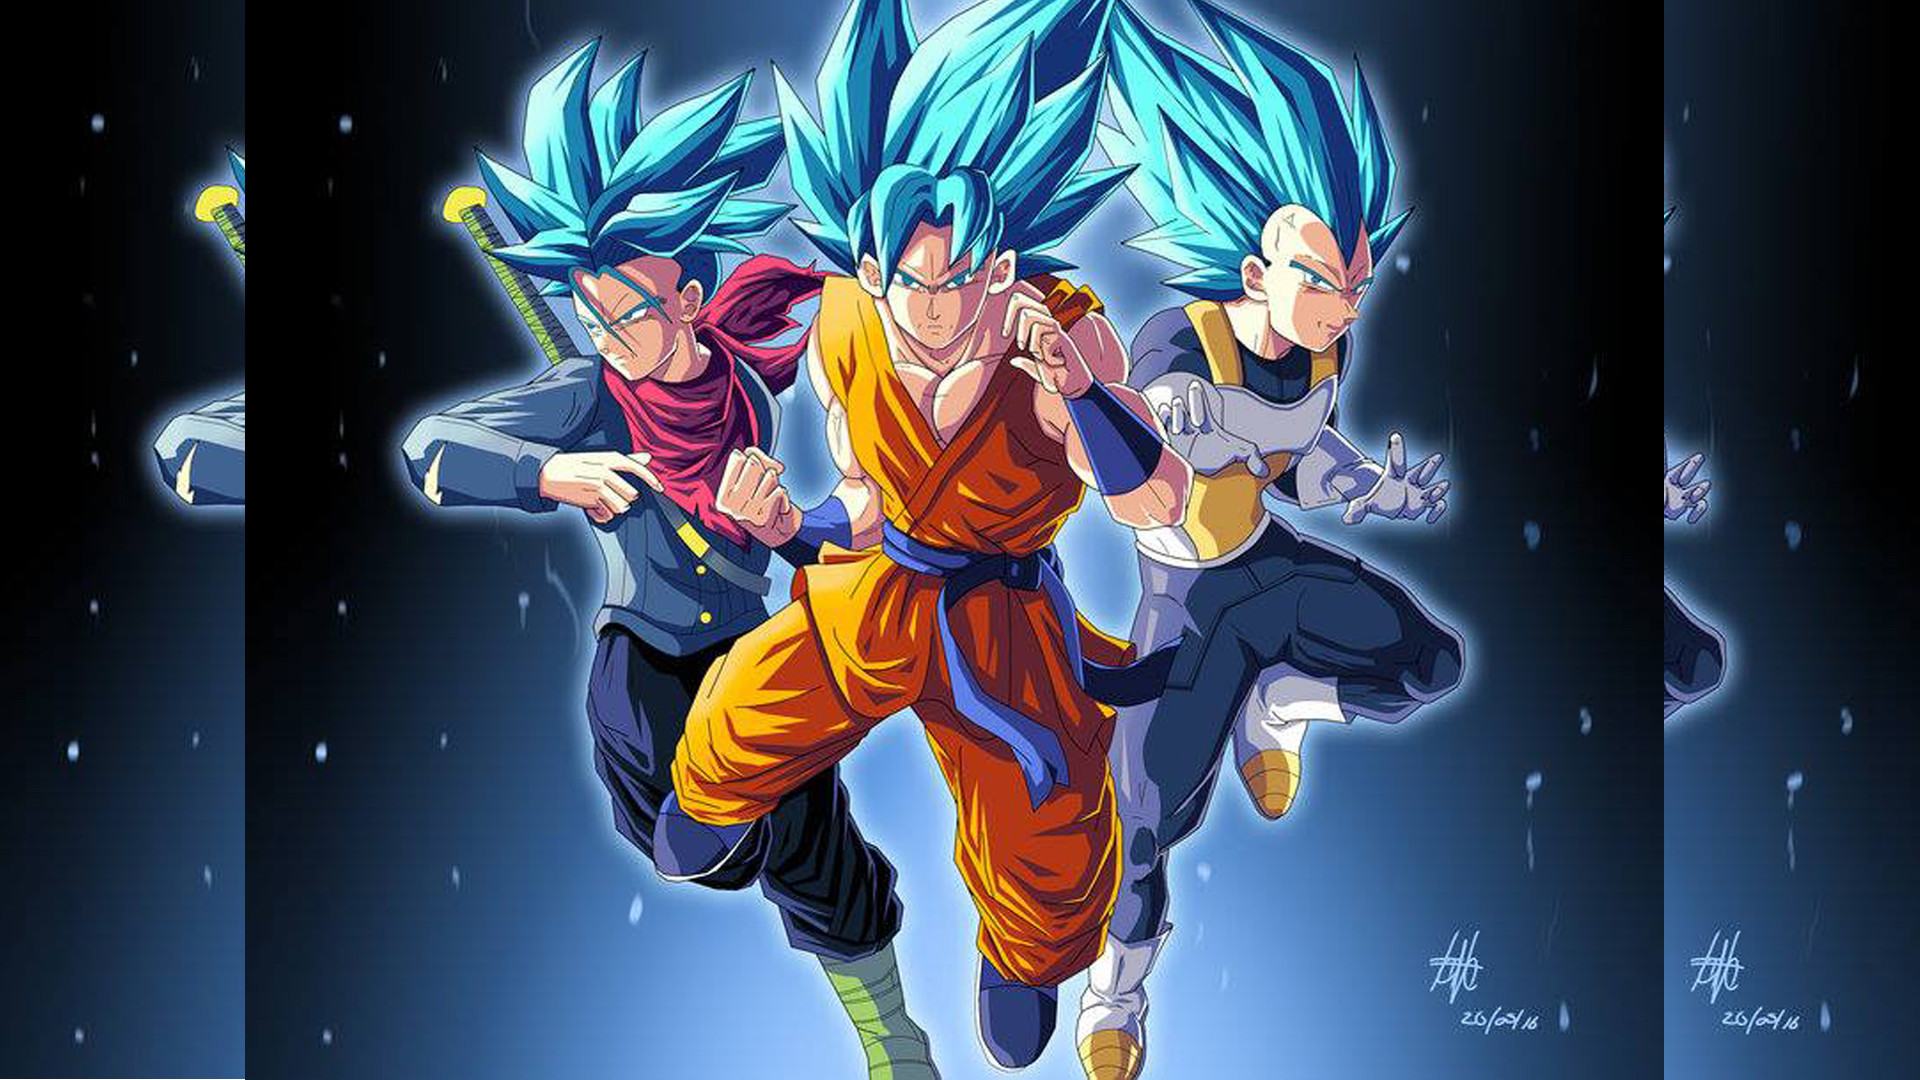 Goku Y Vegeta Ssj Blue Wallpaper Hd Gambarku